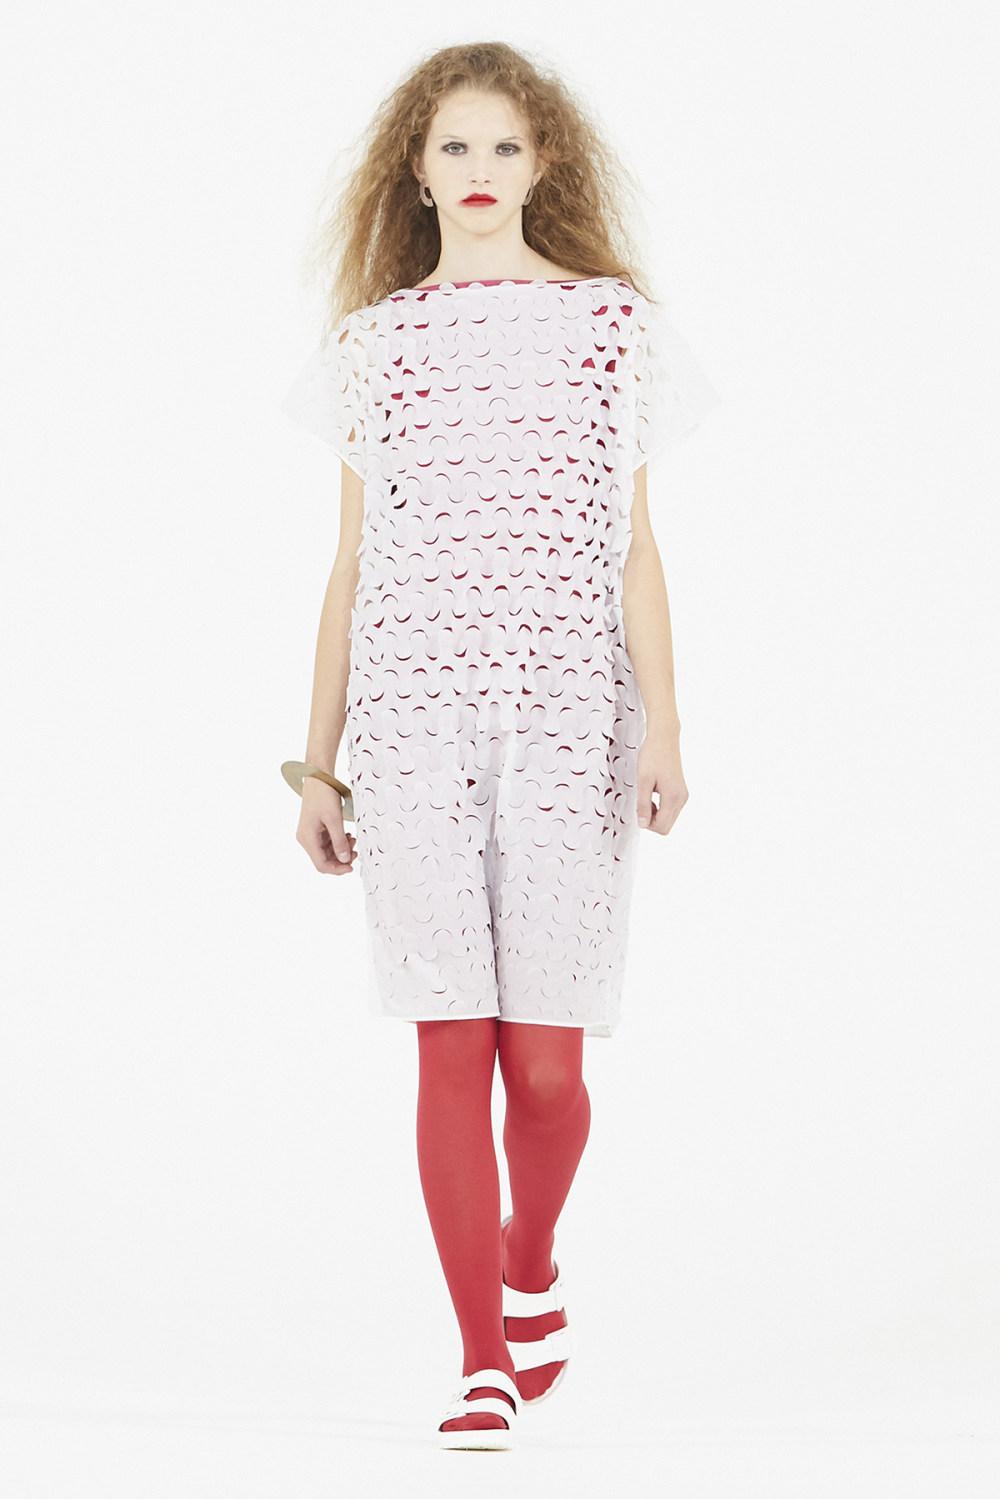 Nicolas Andreas Taralis时装系列技术织物矩形条纹被缝合在一起-9.jpg